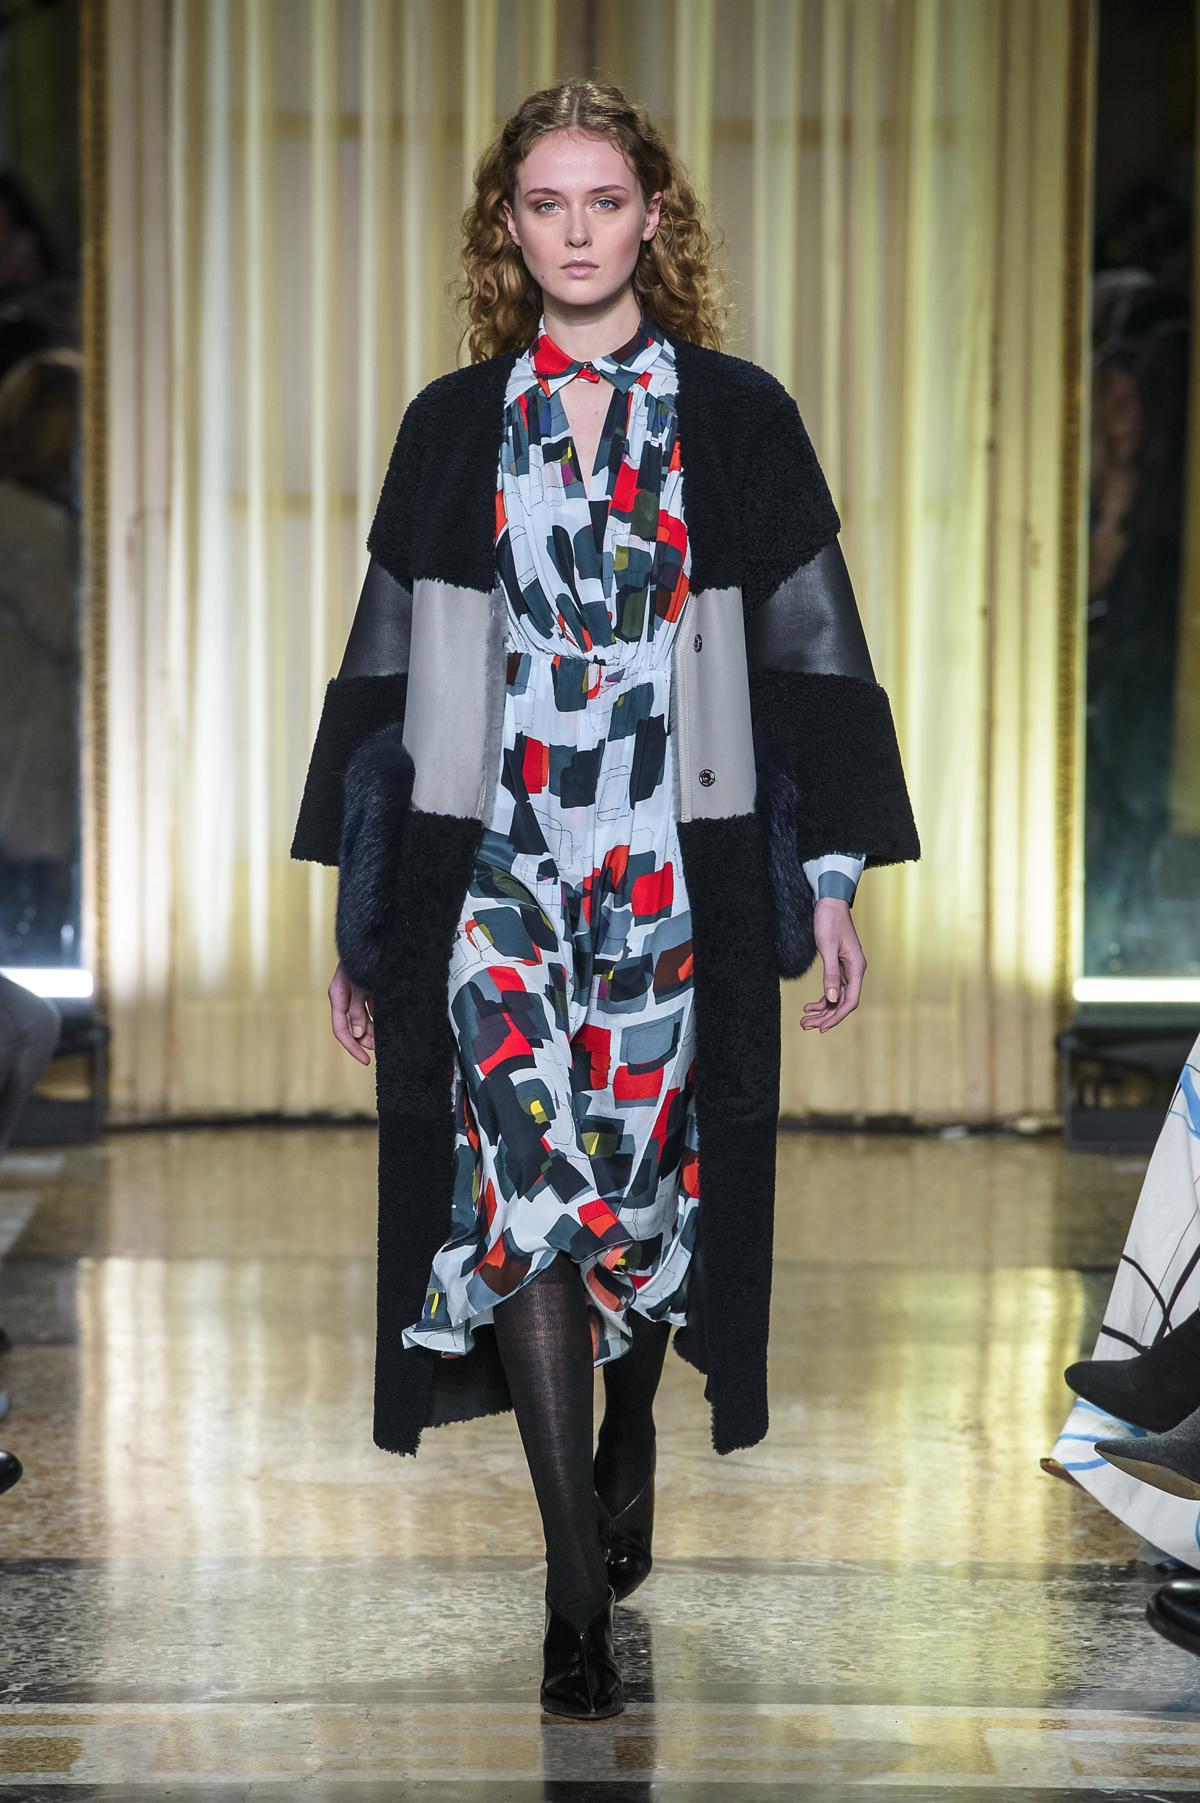 Fashion Times: BLOW-UP. STILOSA BY IGOR GULYAEV